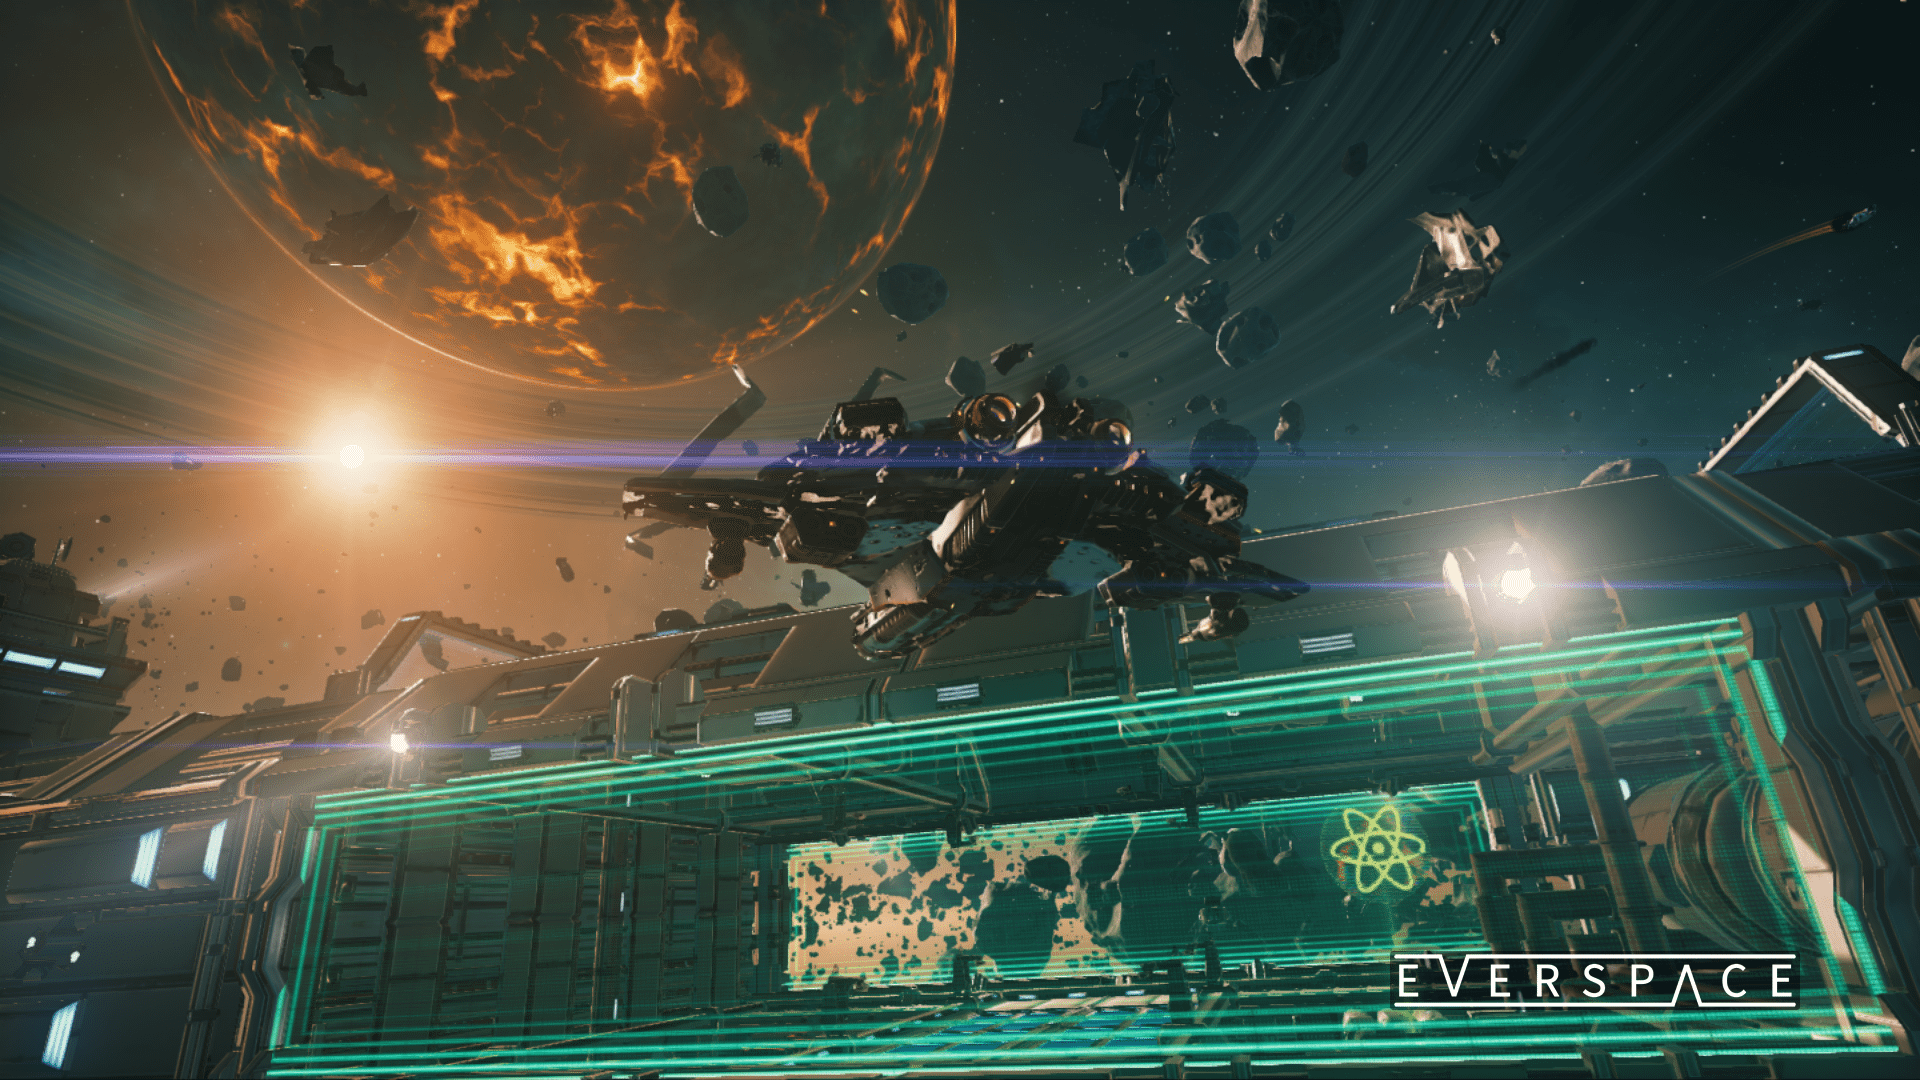 Everspace Screenhot 10